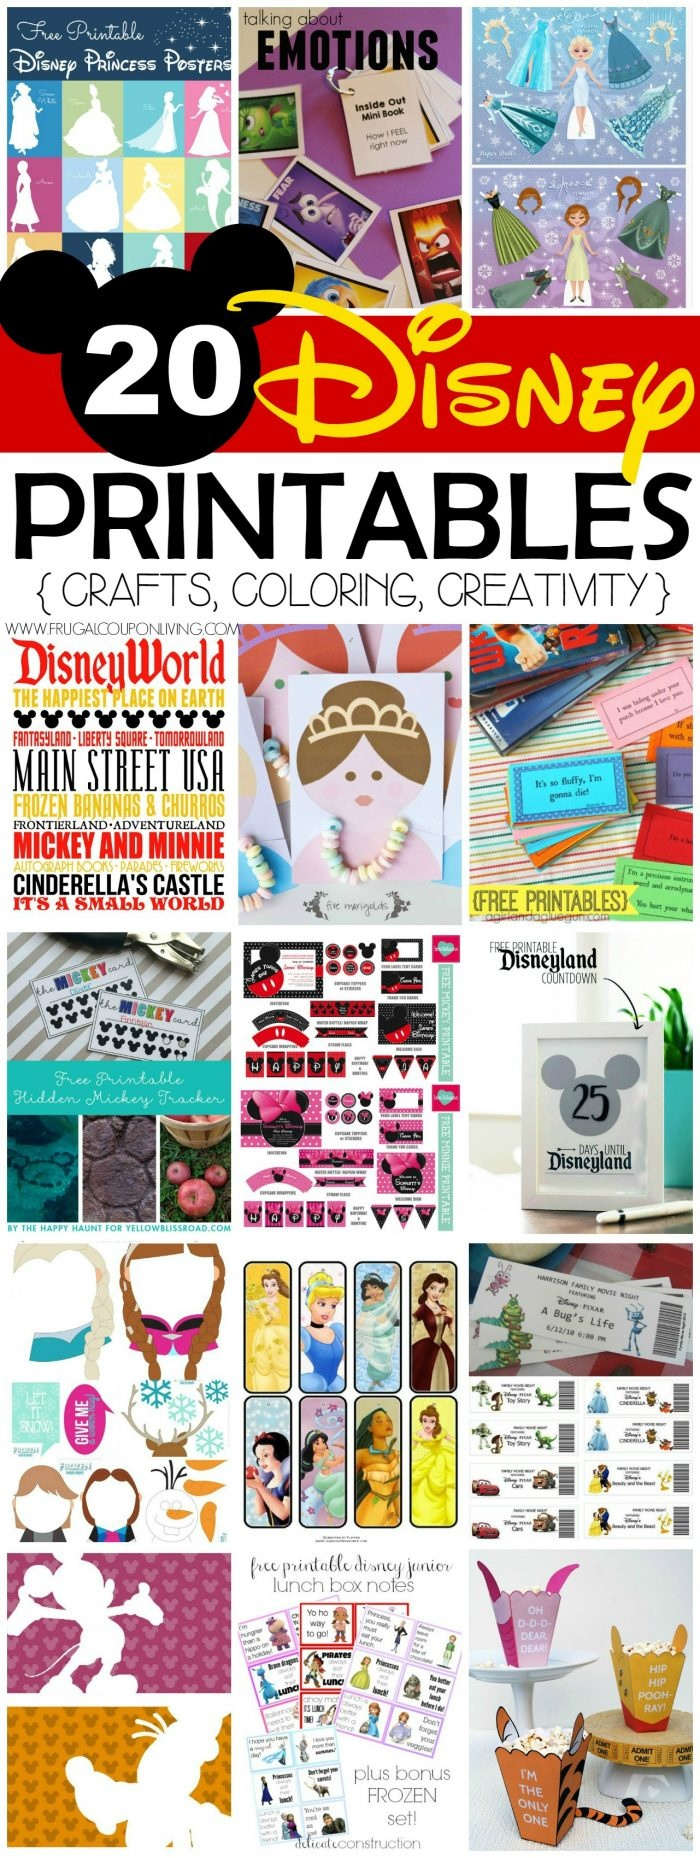 Free Disney Cruise Door Printables - Free Printable Disney Cruise Door Magnets